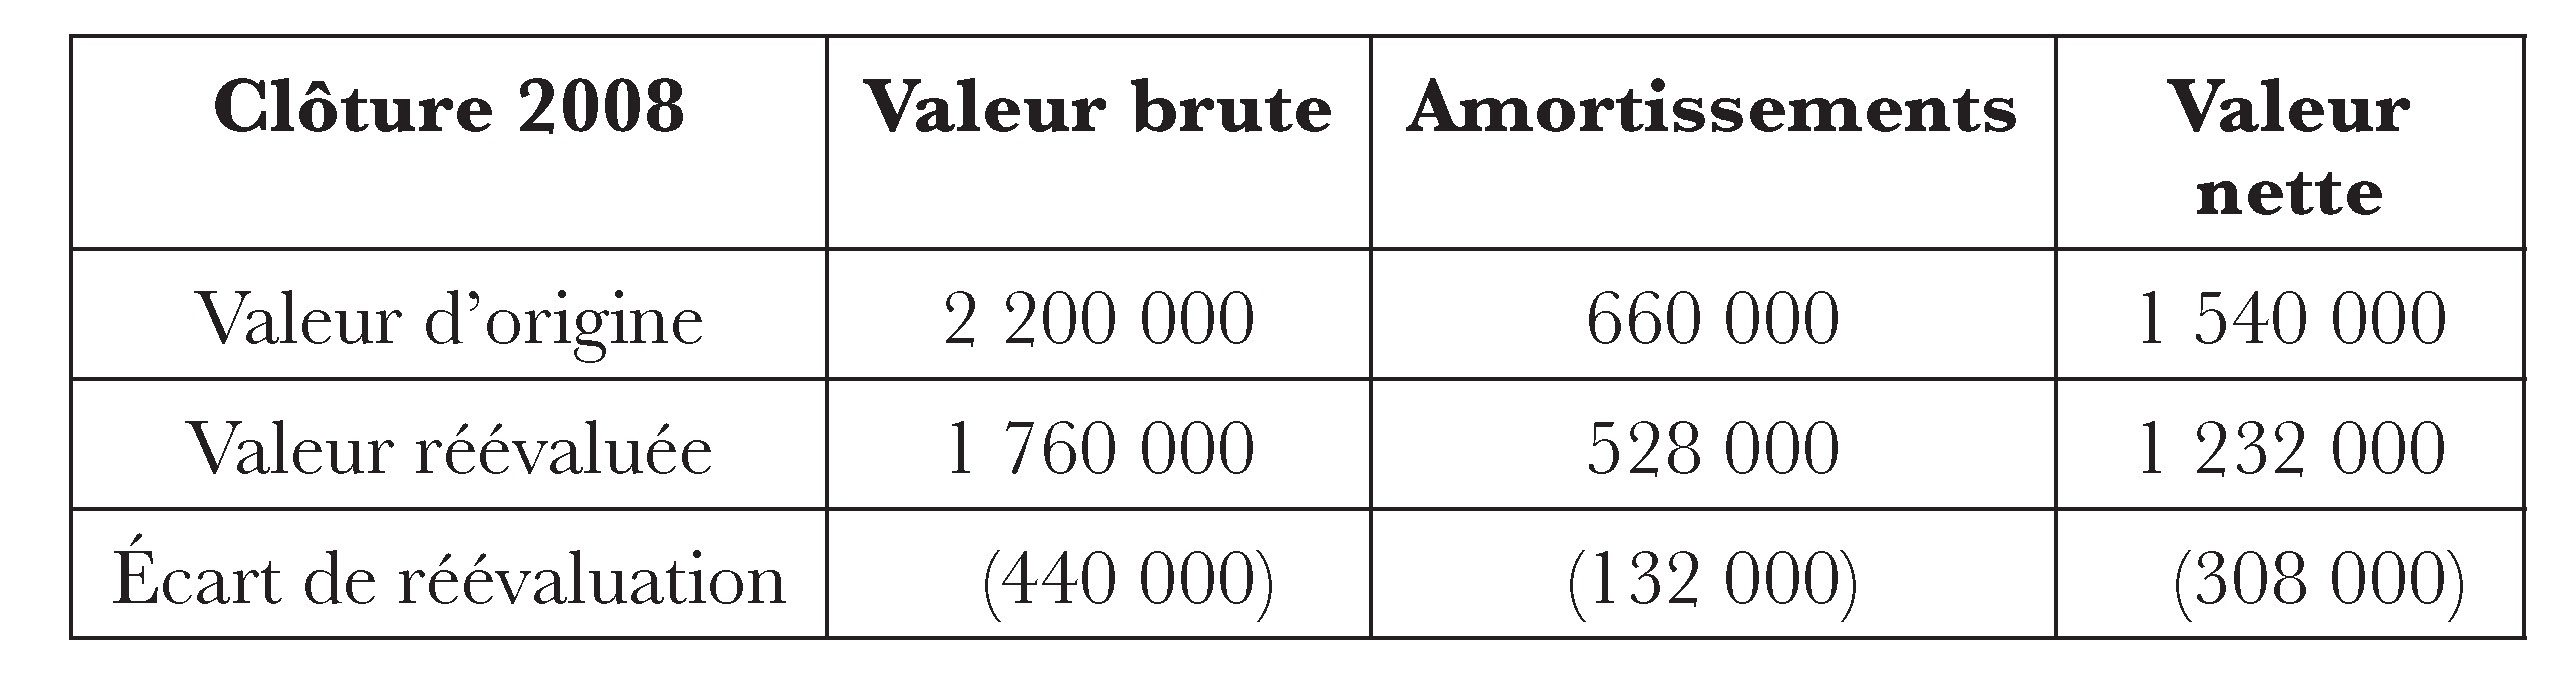 3 Lire Le Bilan Cairn Info